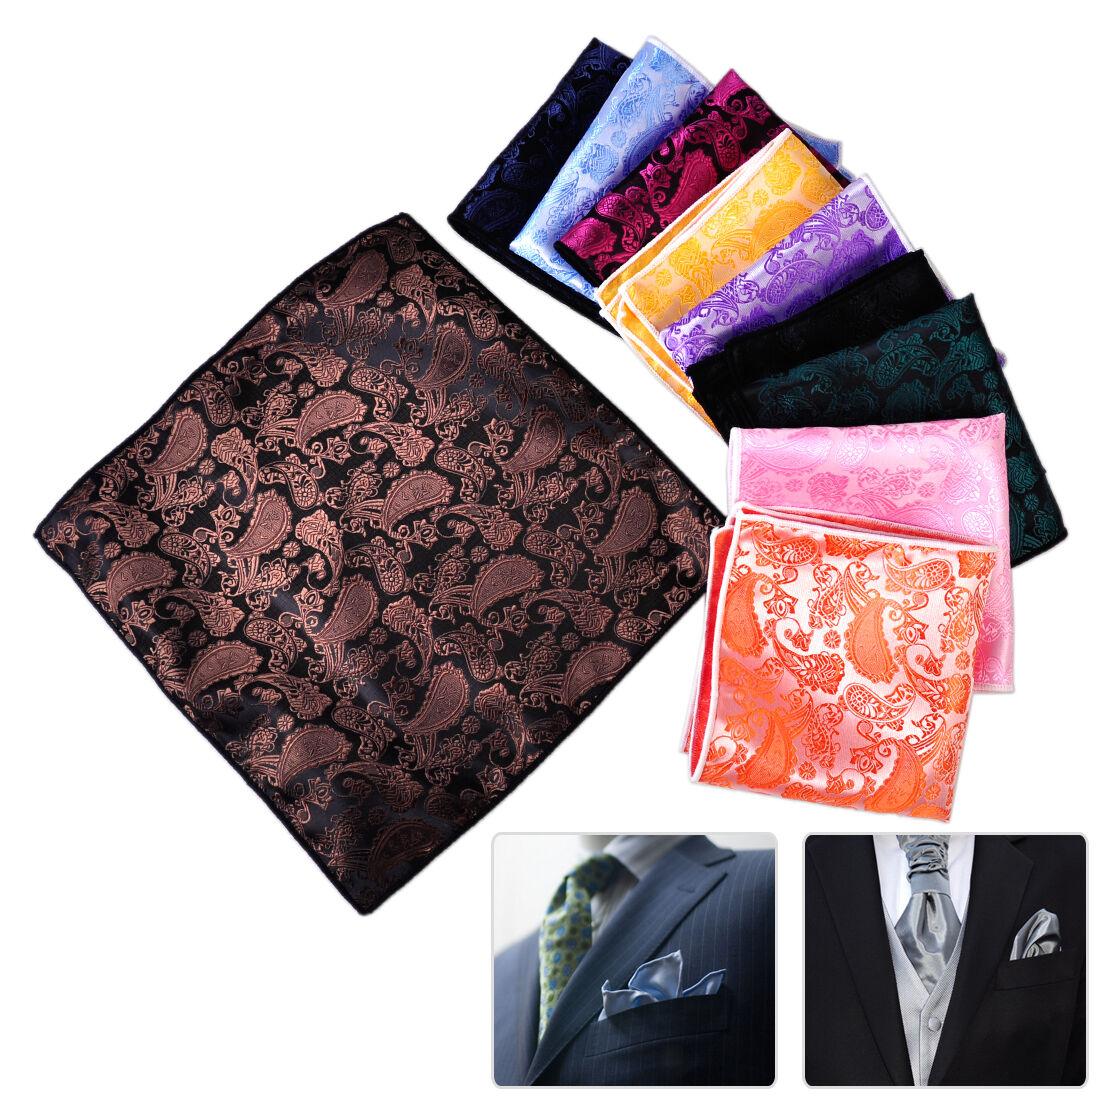 10pc Men Paisley Floral Handkerchief Square Pocket Jacquard Hanky Hankie Wedding